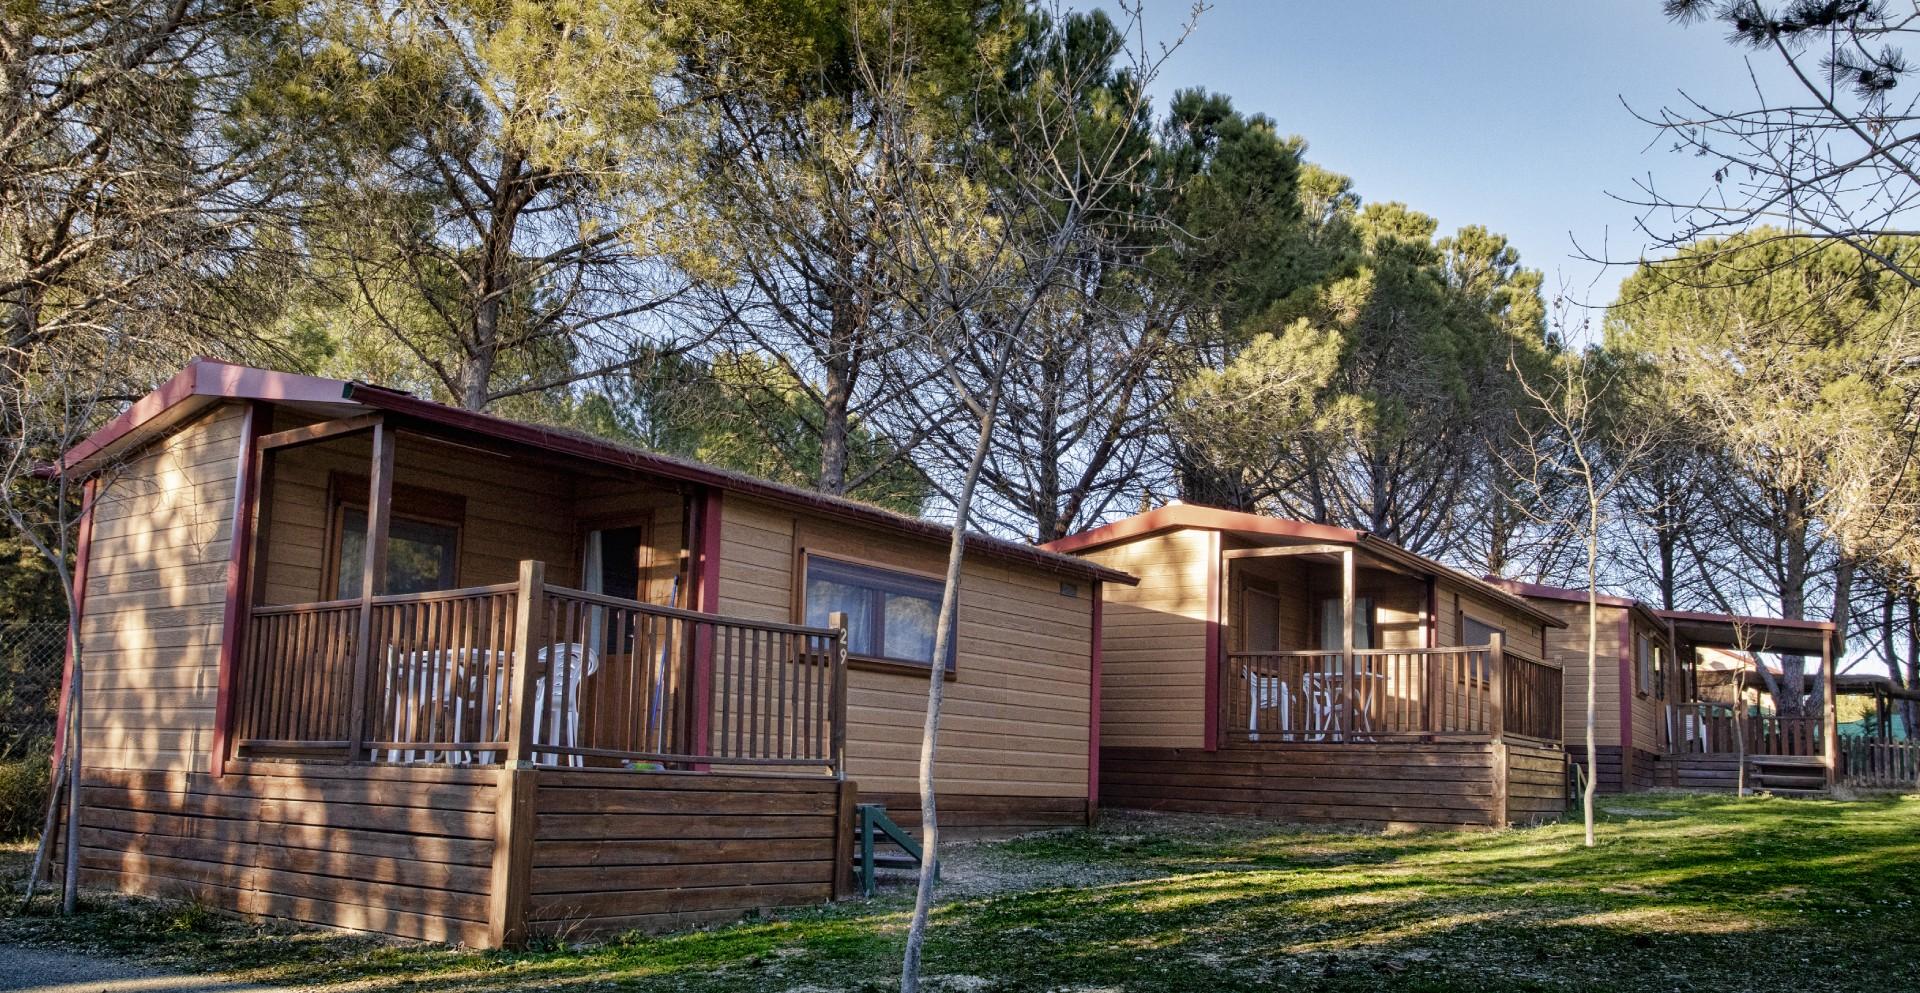 Descubre los bungalows de camping Bolaso Zaragoza